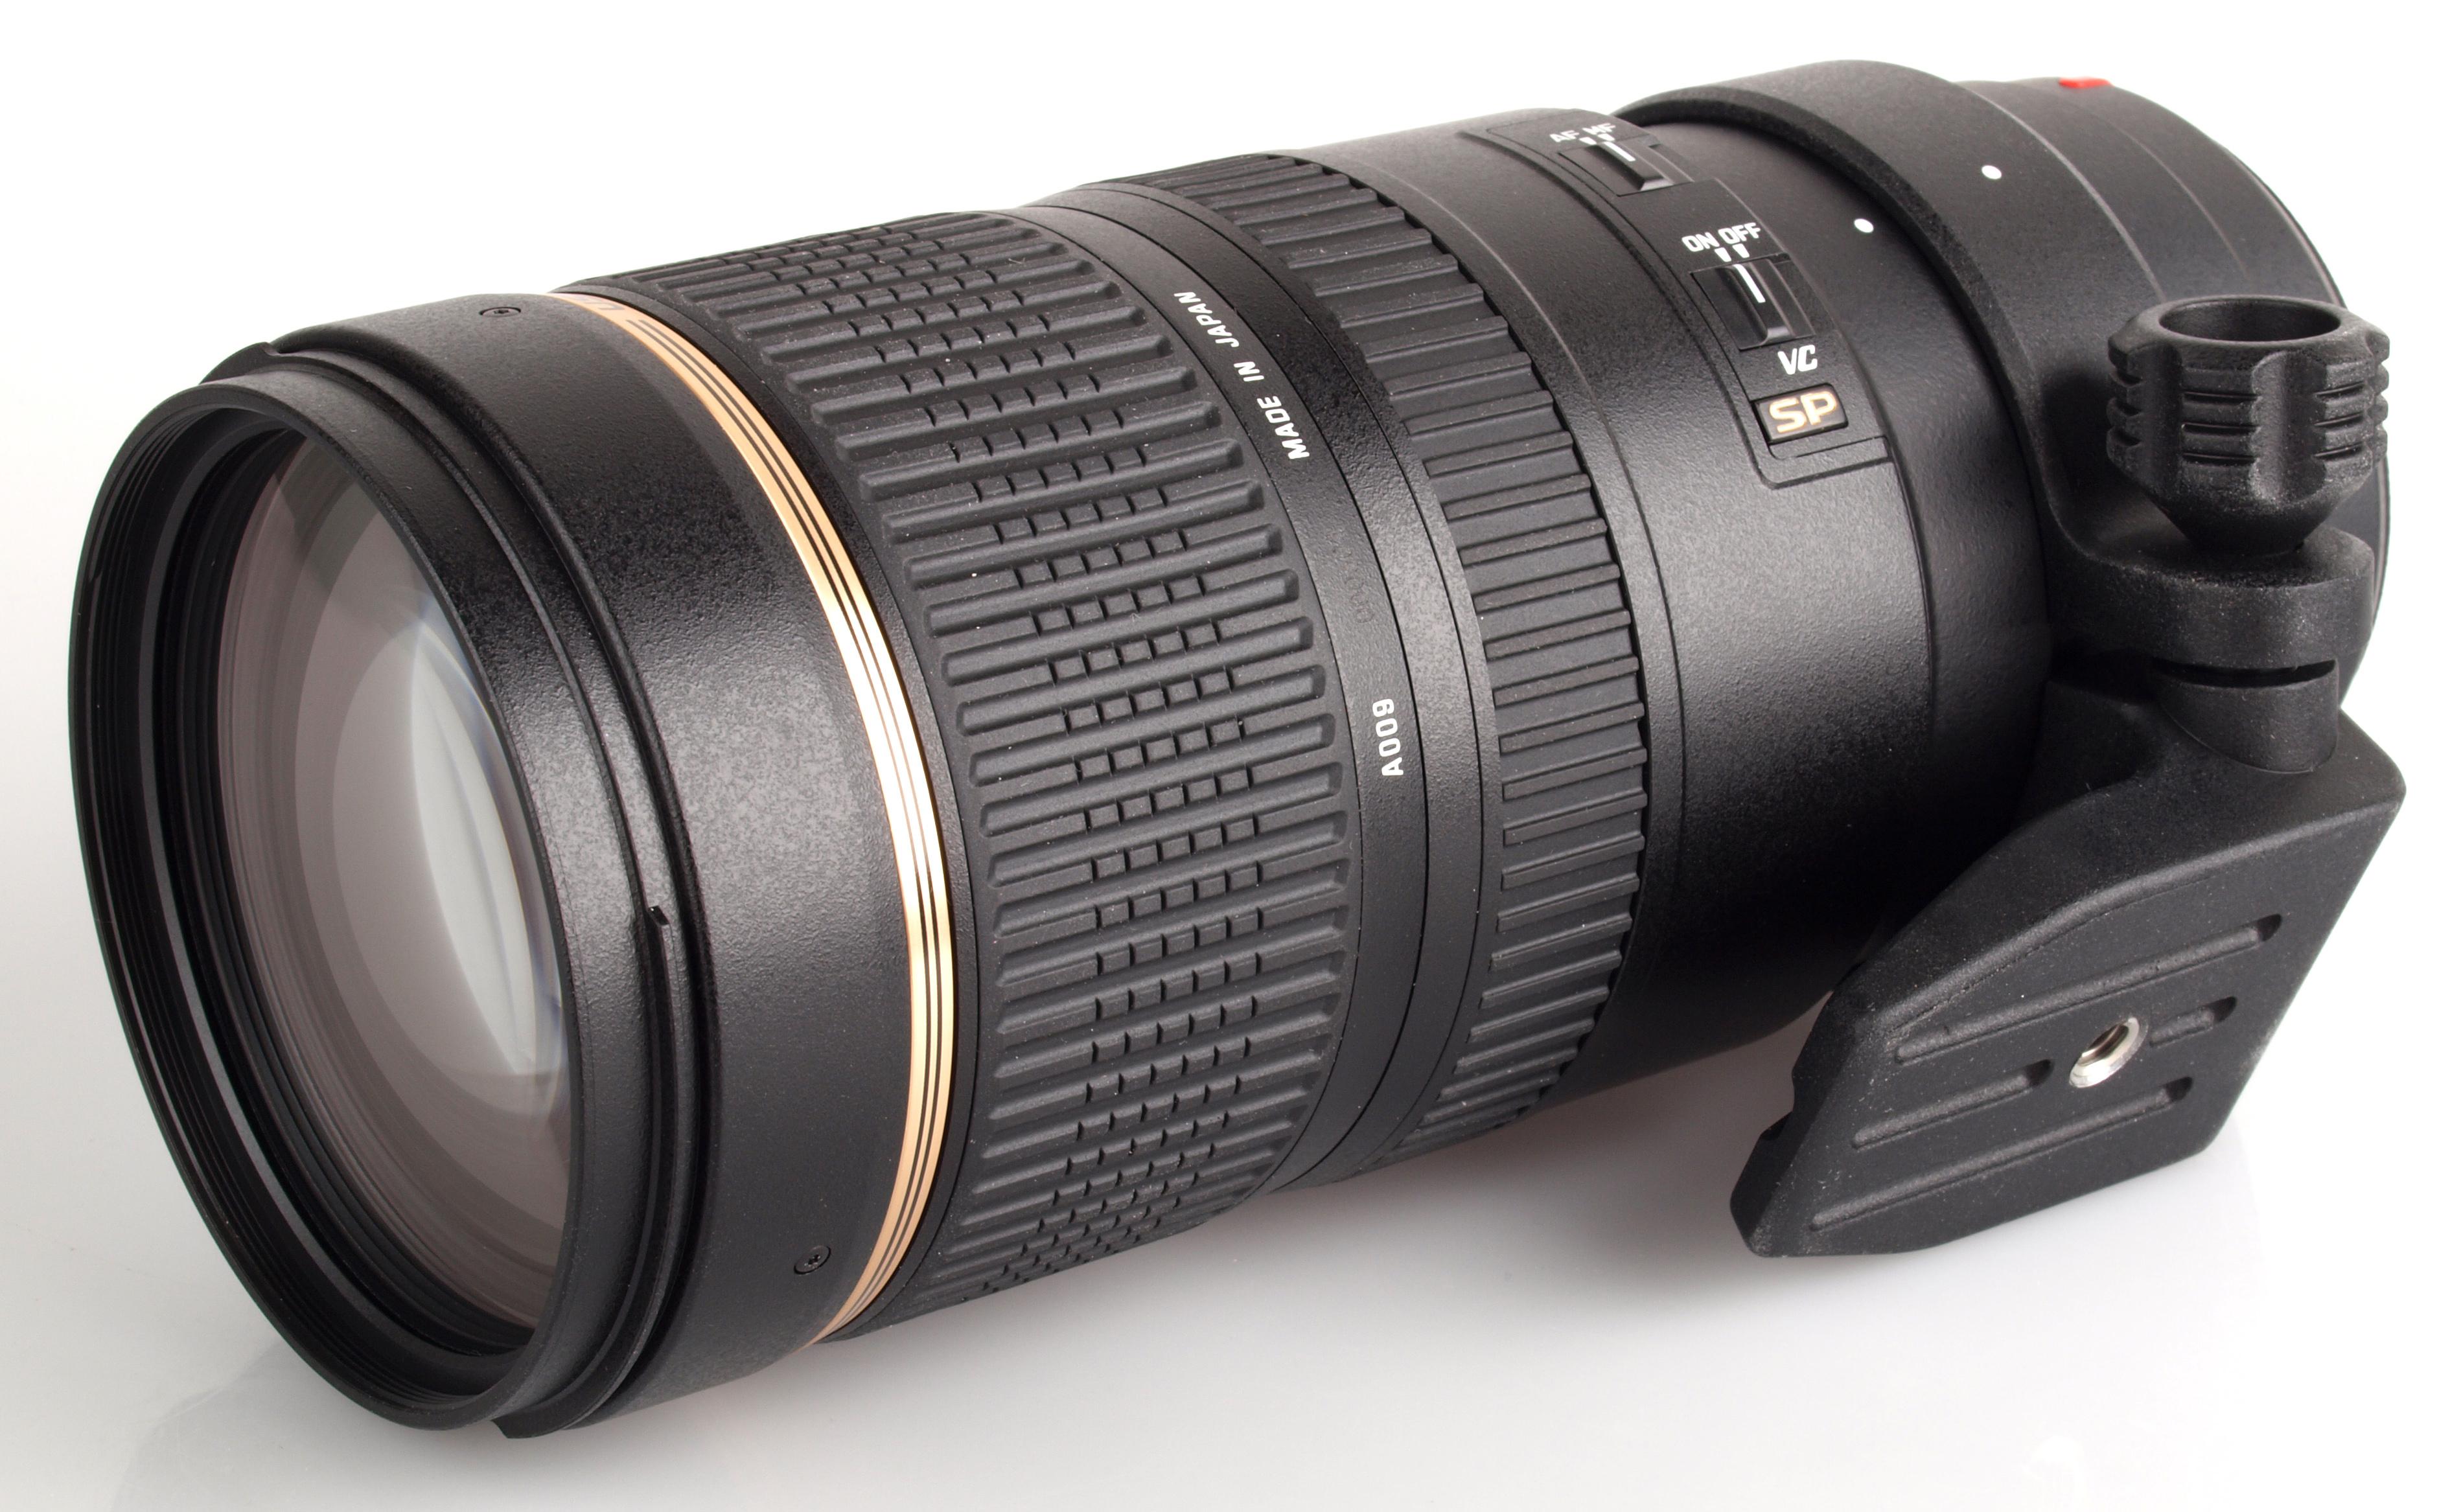 Tamron Sp 70-200Mm F/2.8 Di Vc Usd Lens Review | Ephotozine